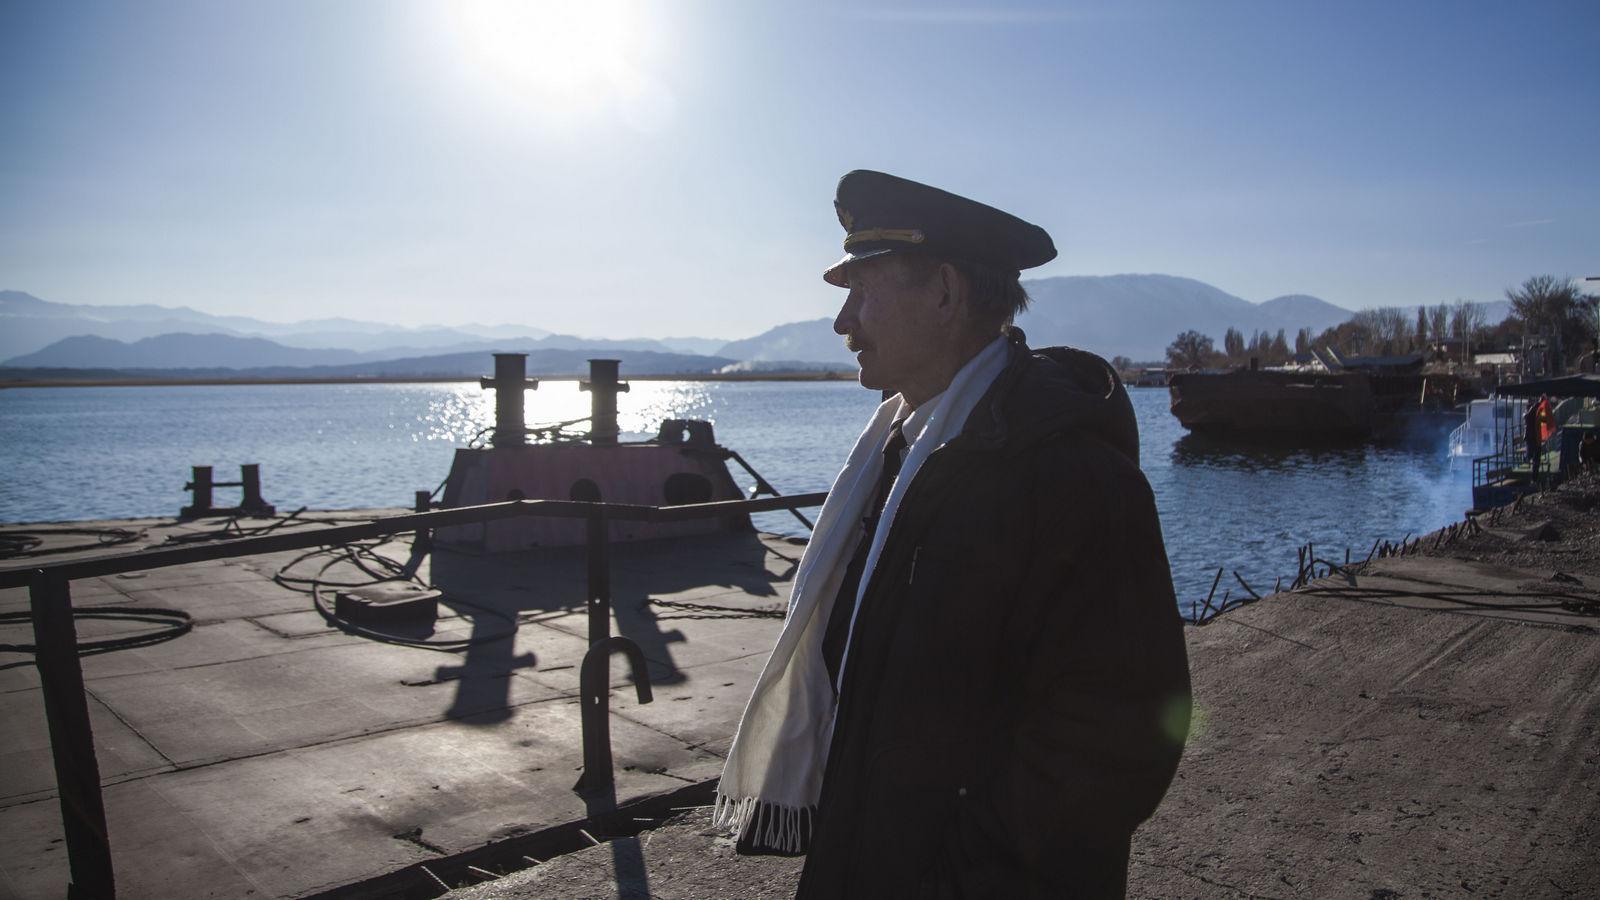 Boris Tchumakov Issyk-Koul Compagnie de navigation Fret Kirghizstan Lac Faillite